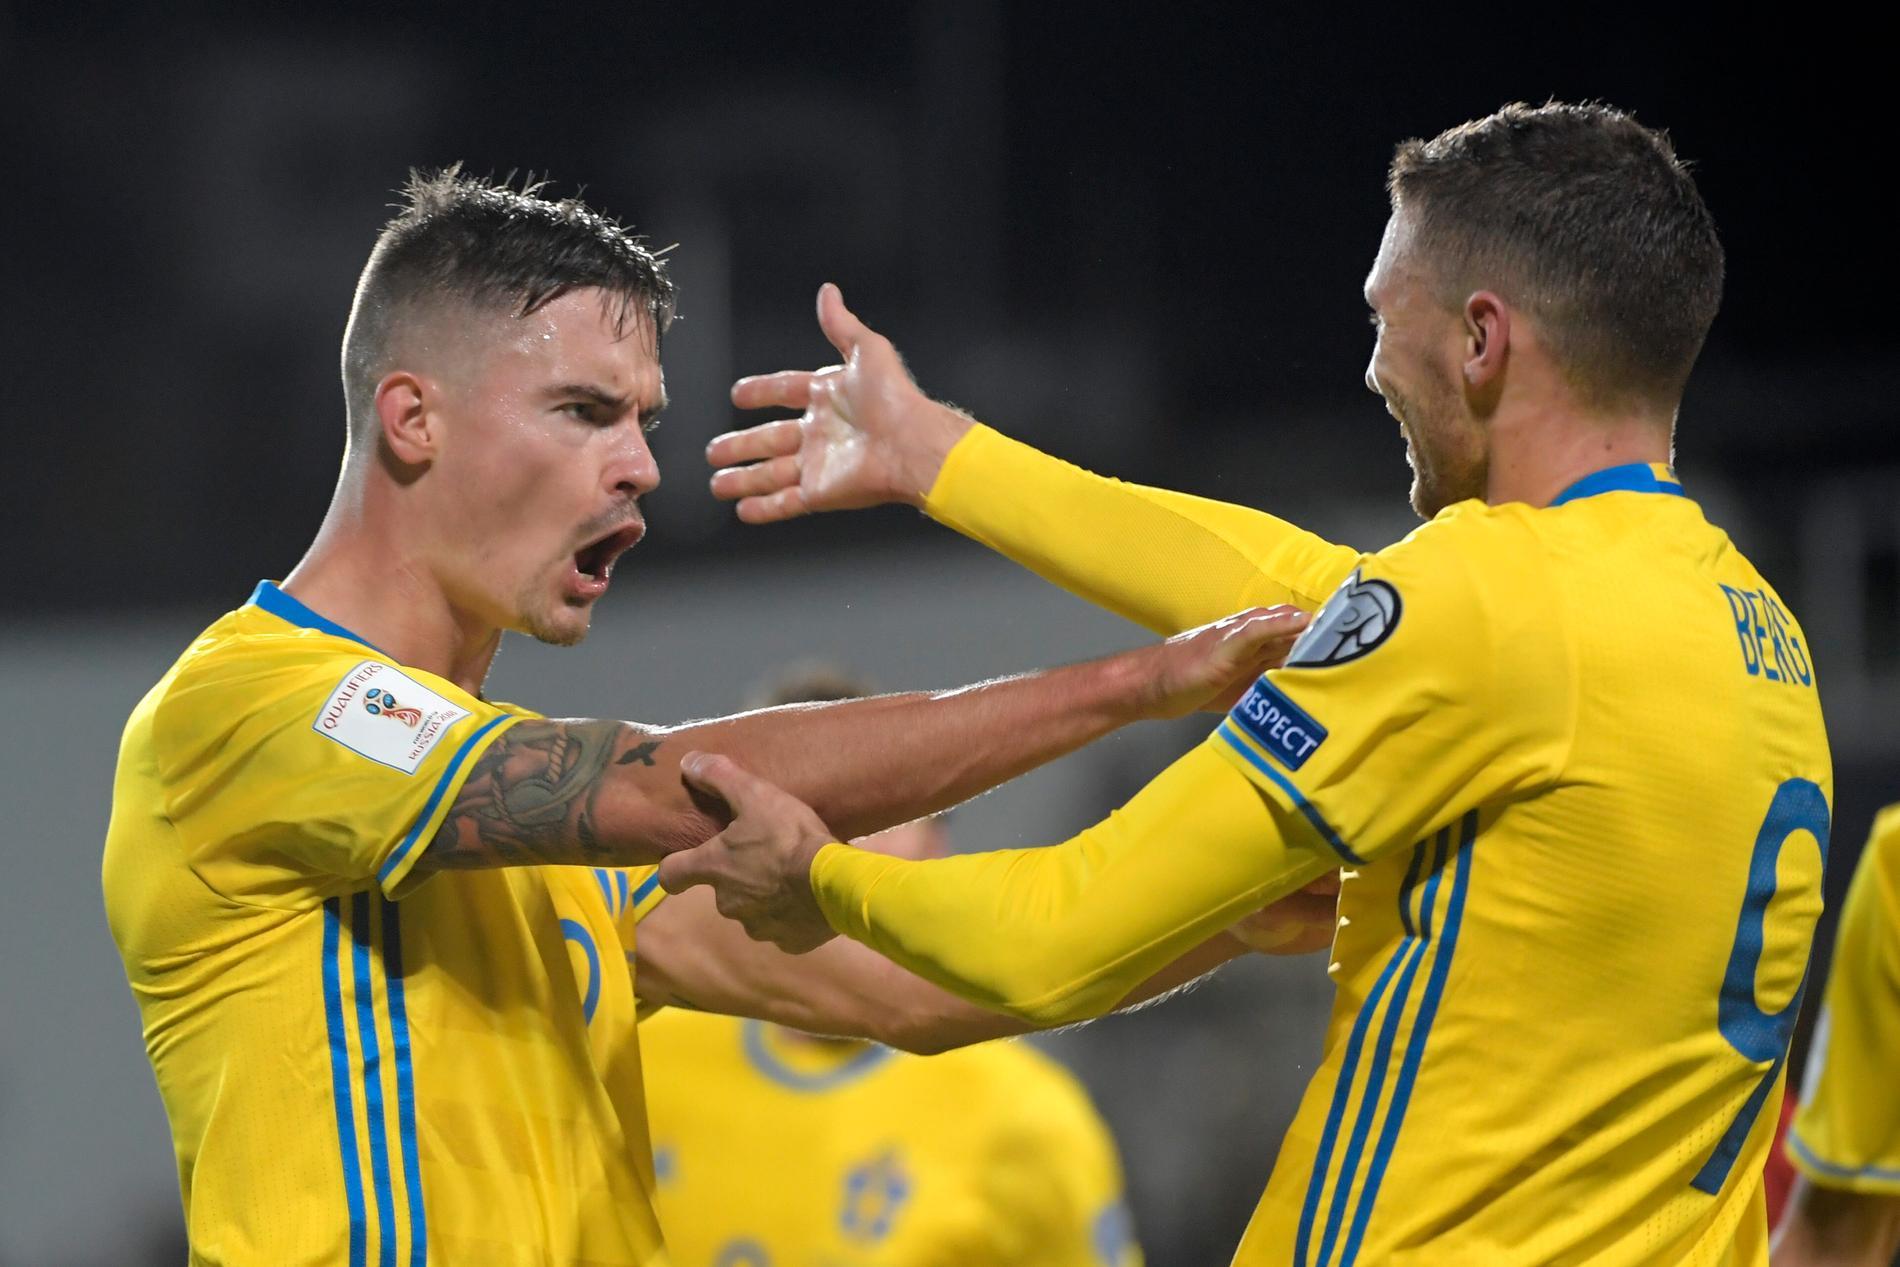 Vitryssland-Sverige i VM-kvalet spelas 3 september